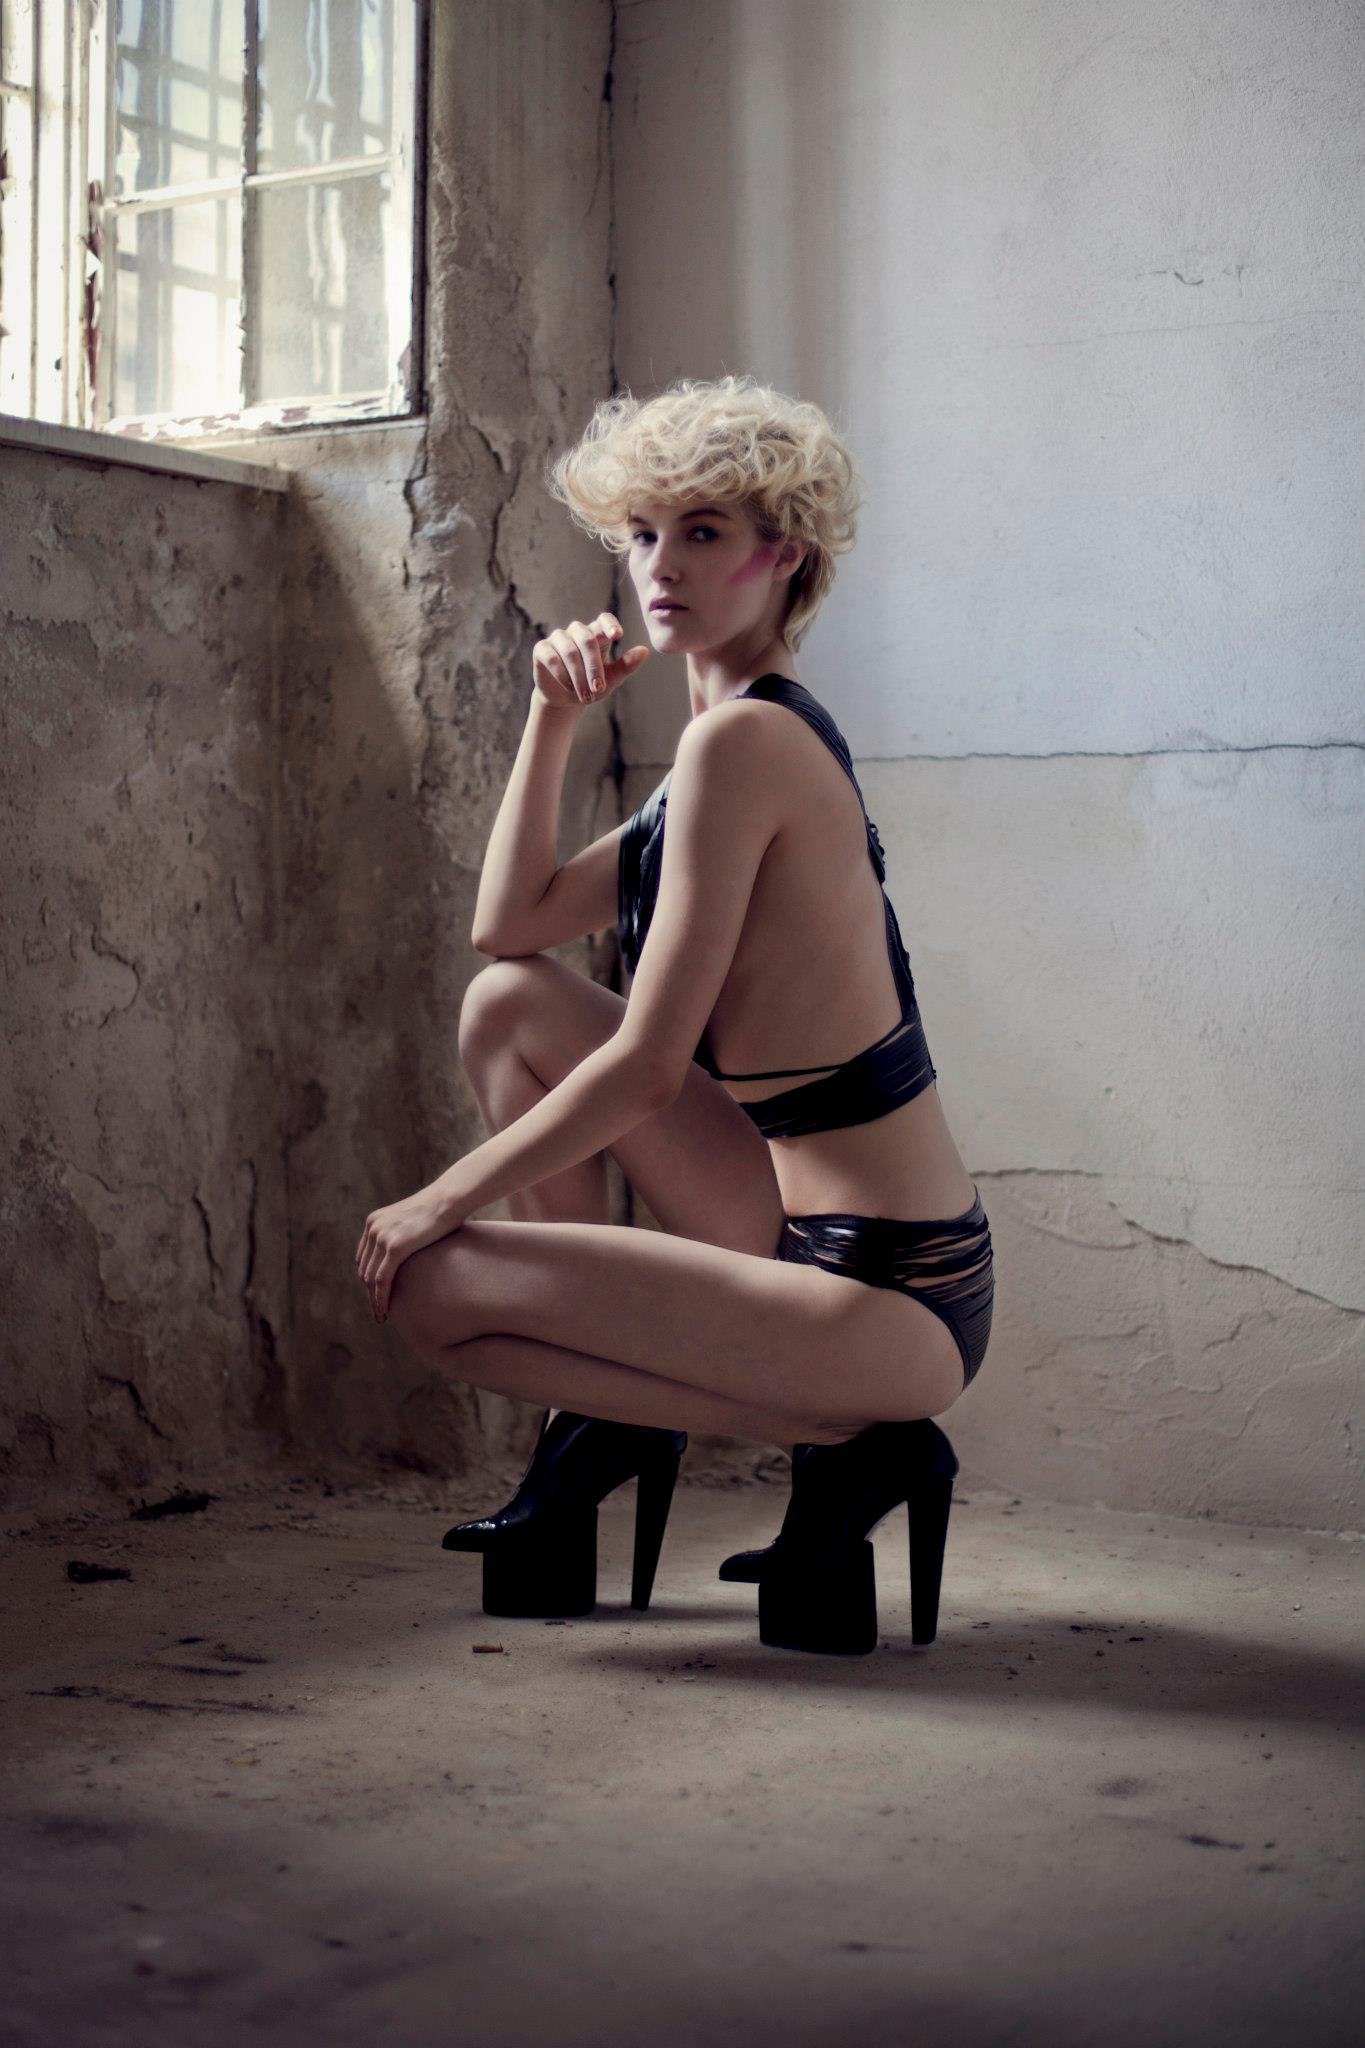 Bernd Serafin Thaler Luise Hanna Reichert Maryia Shoes